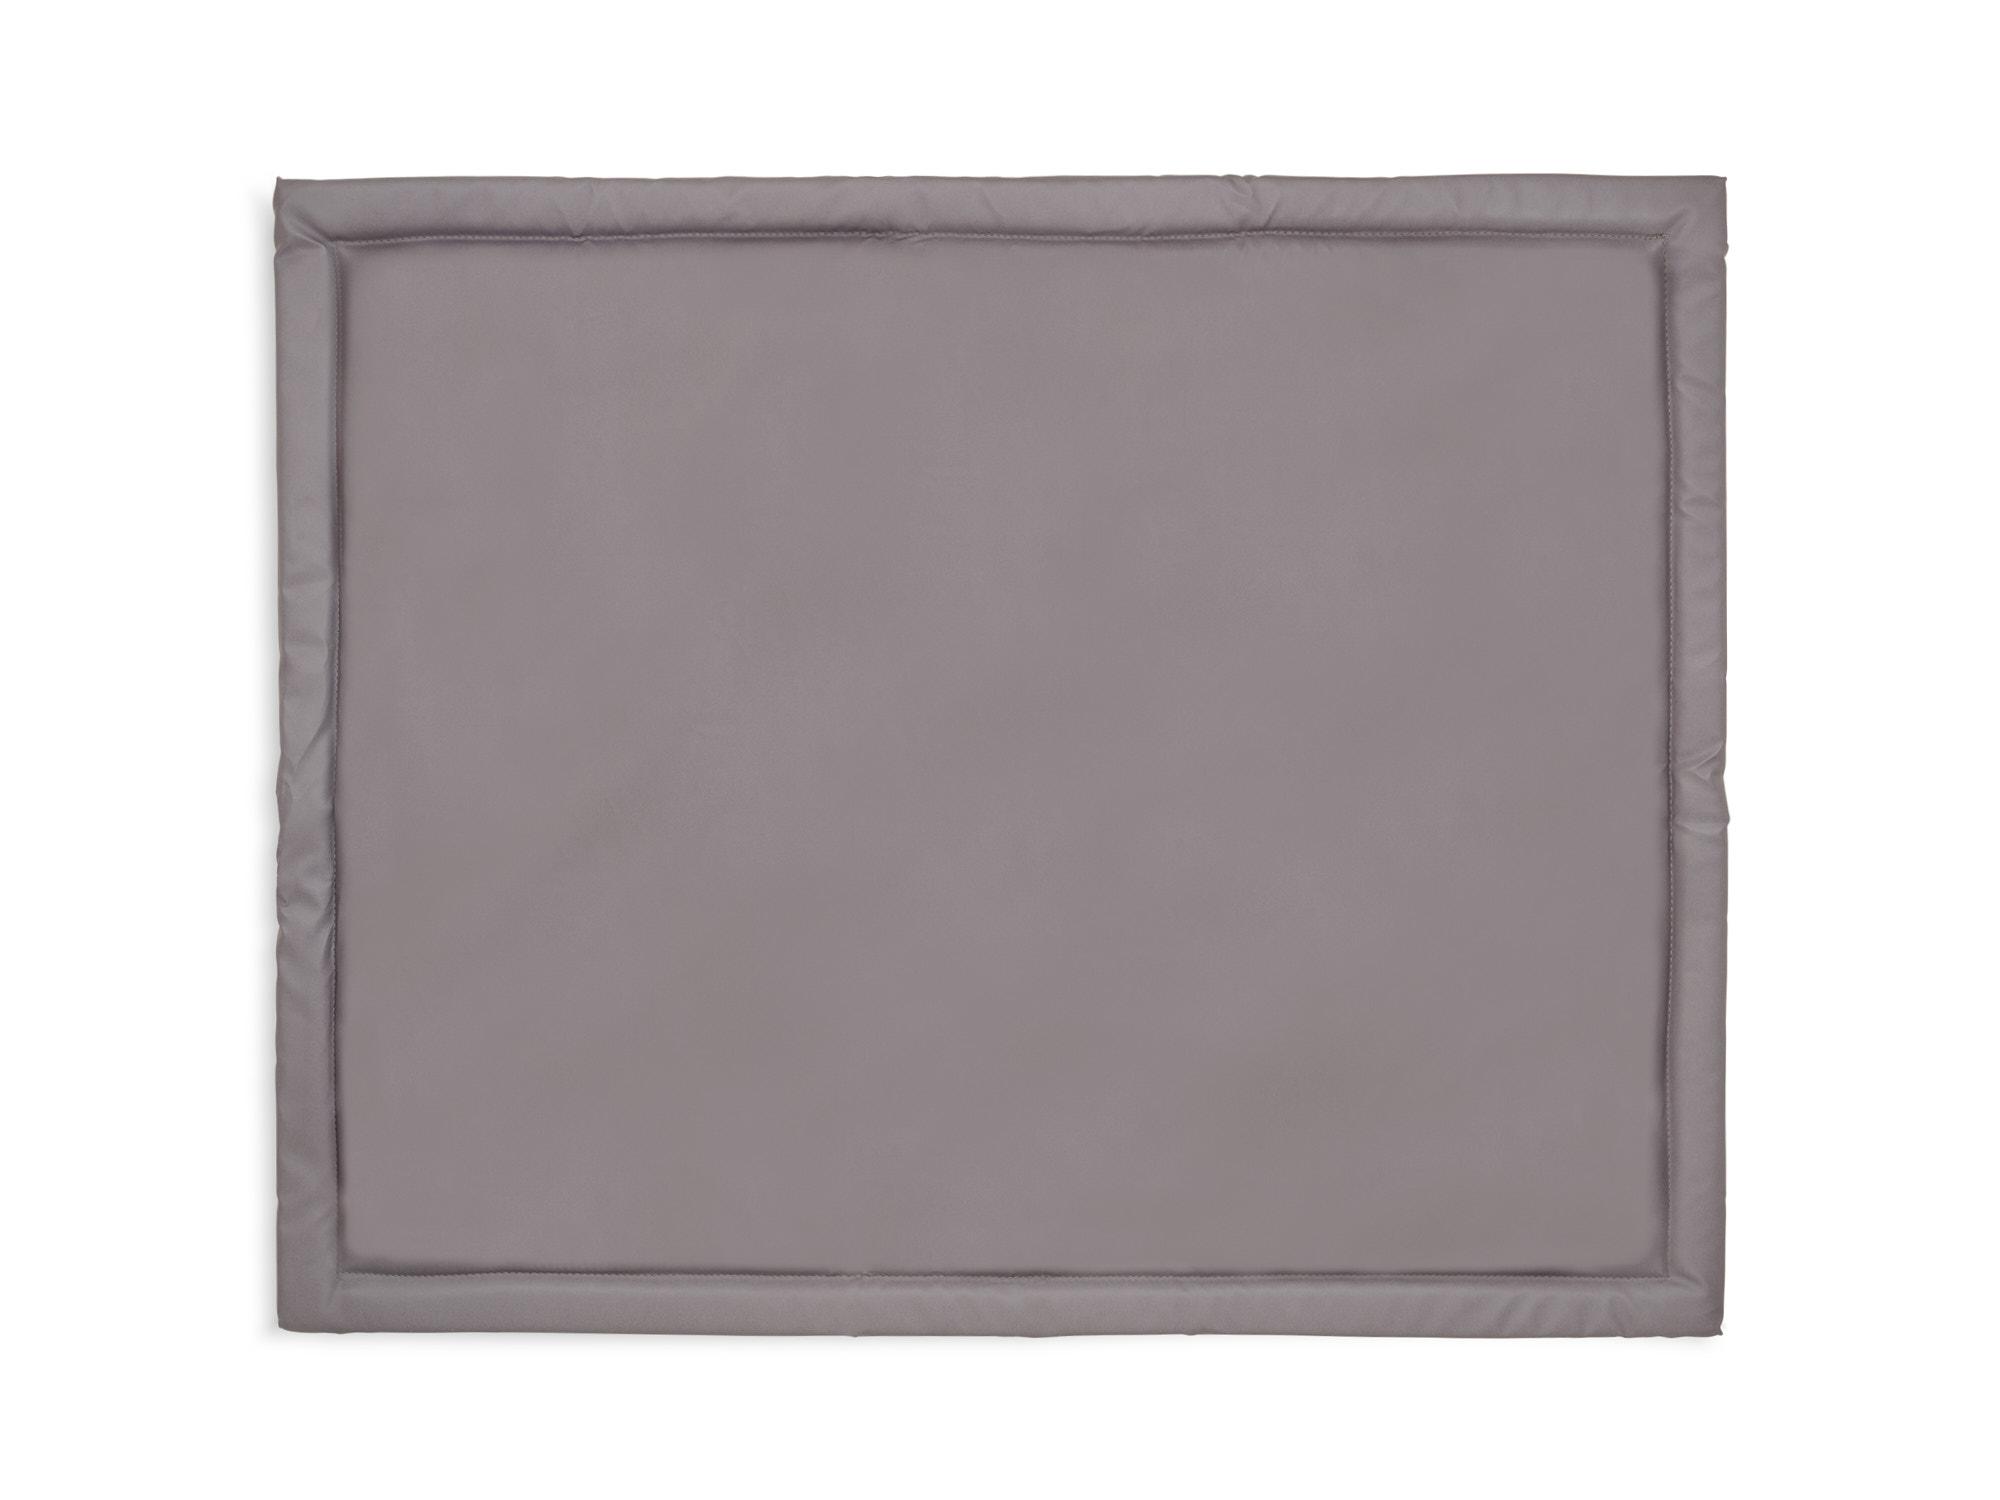 Laufgittereinlage Krabbeldecke Basic grau (75x95 cm)